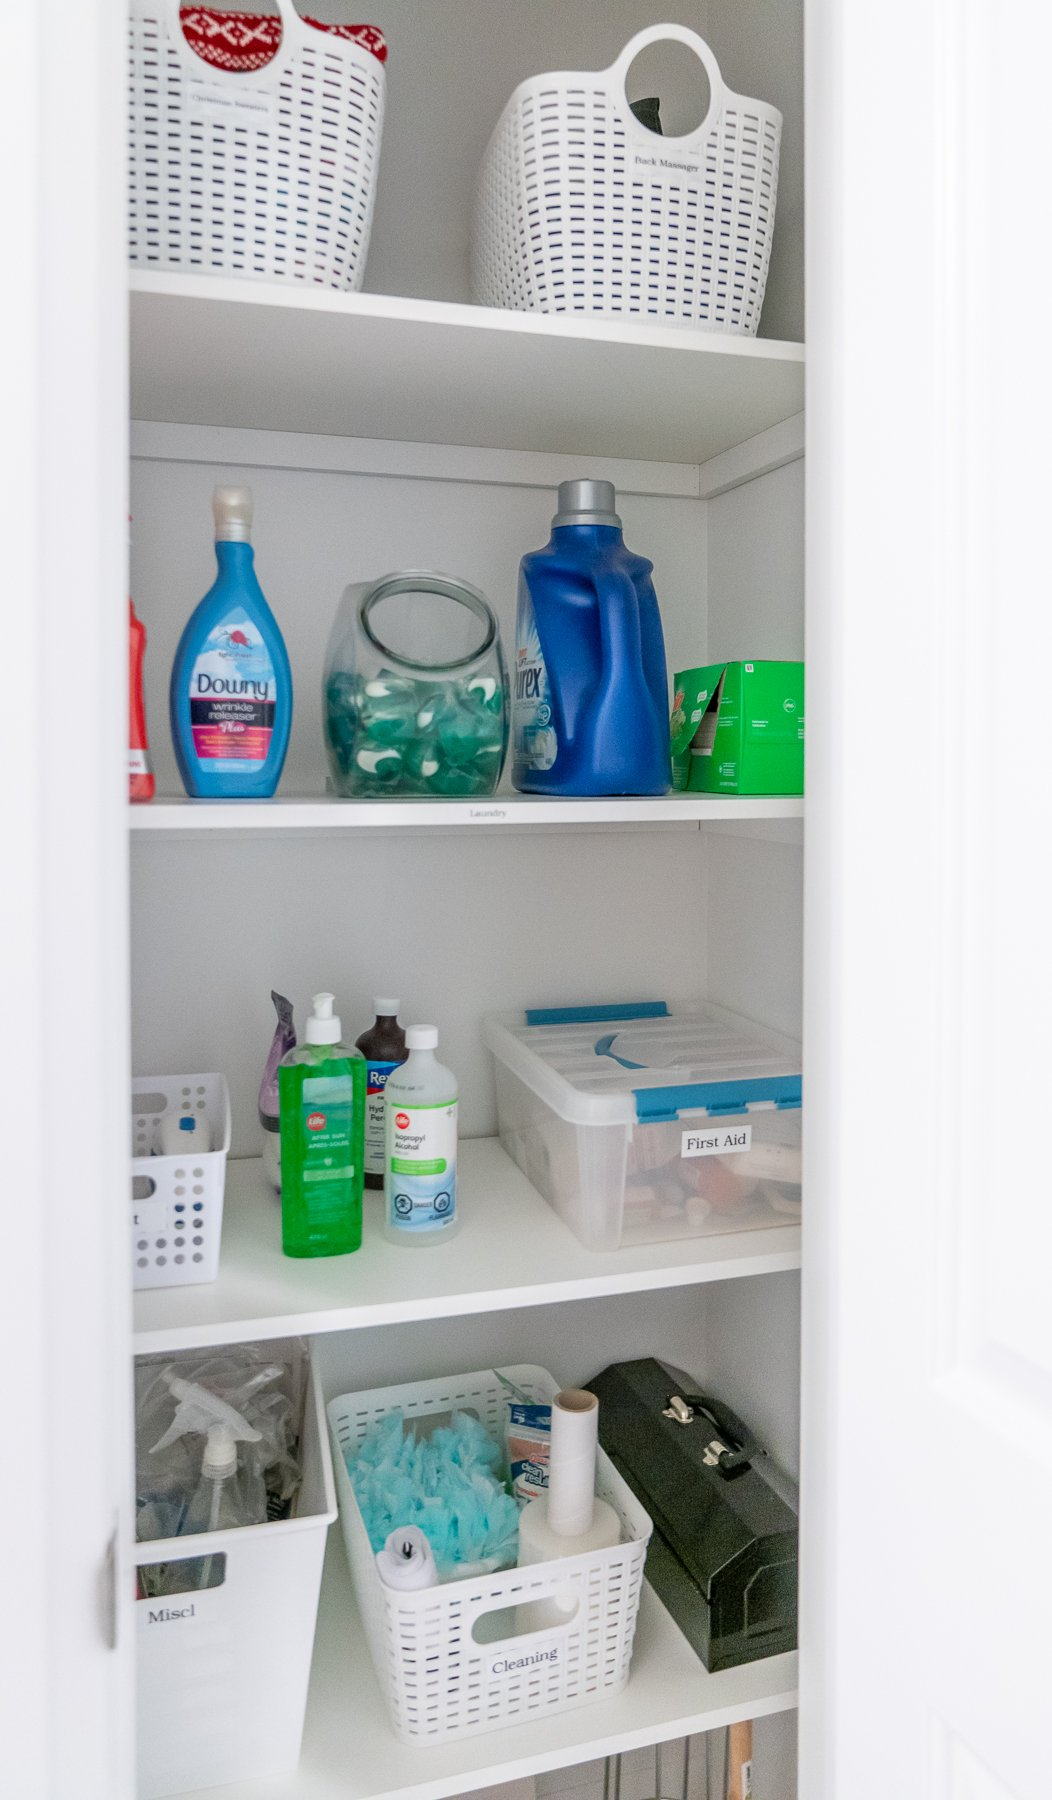 trish closet supplies after - LAUNDRY ROOM CLOSET